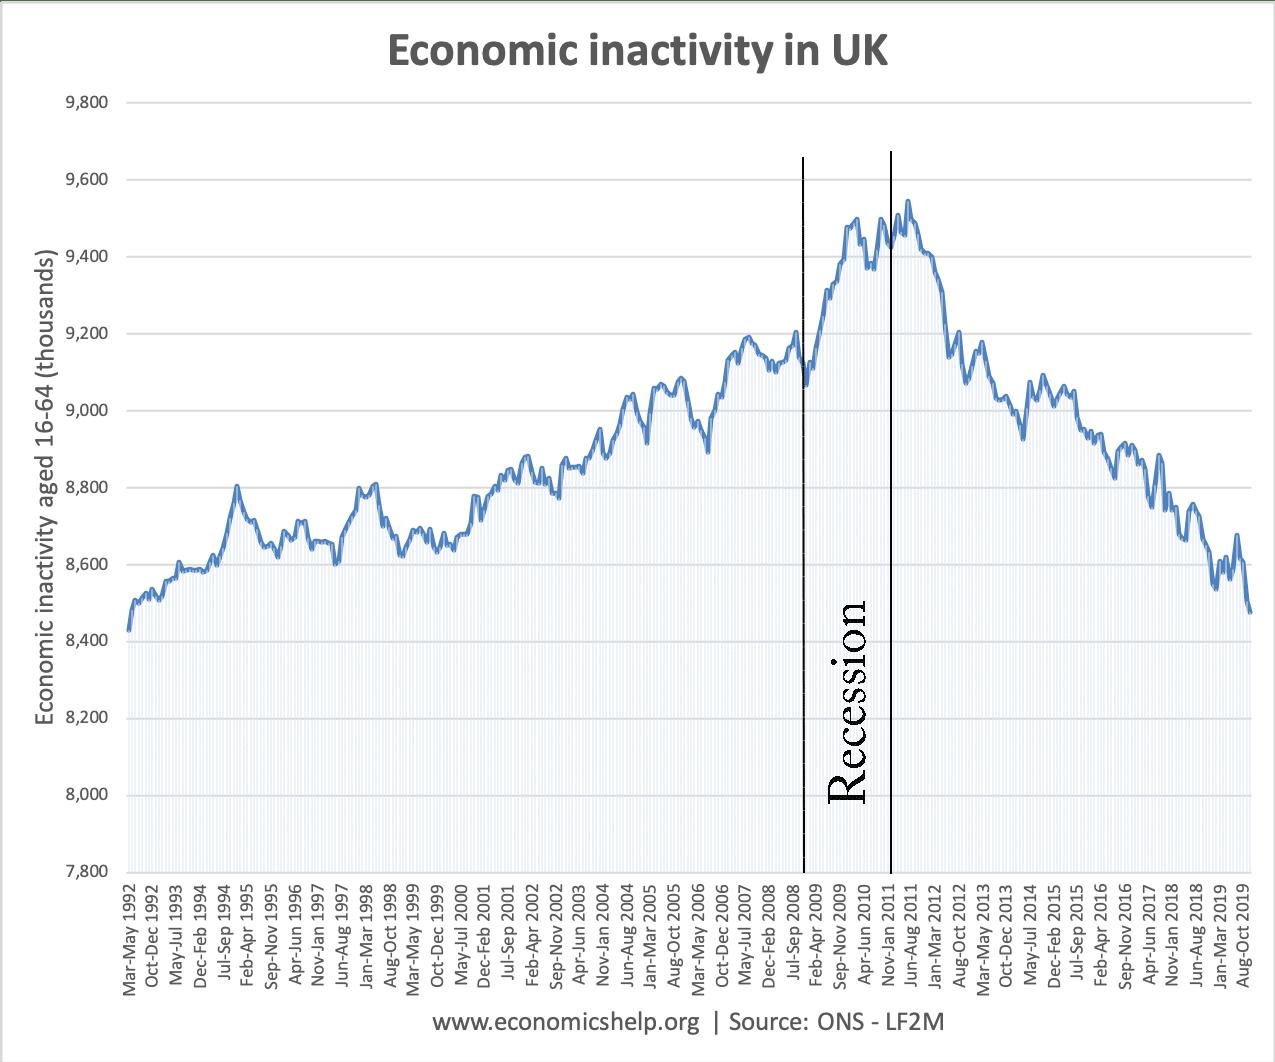 trends-in-economic-inactivity